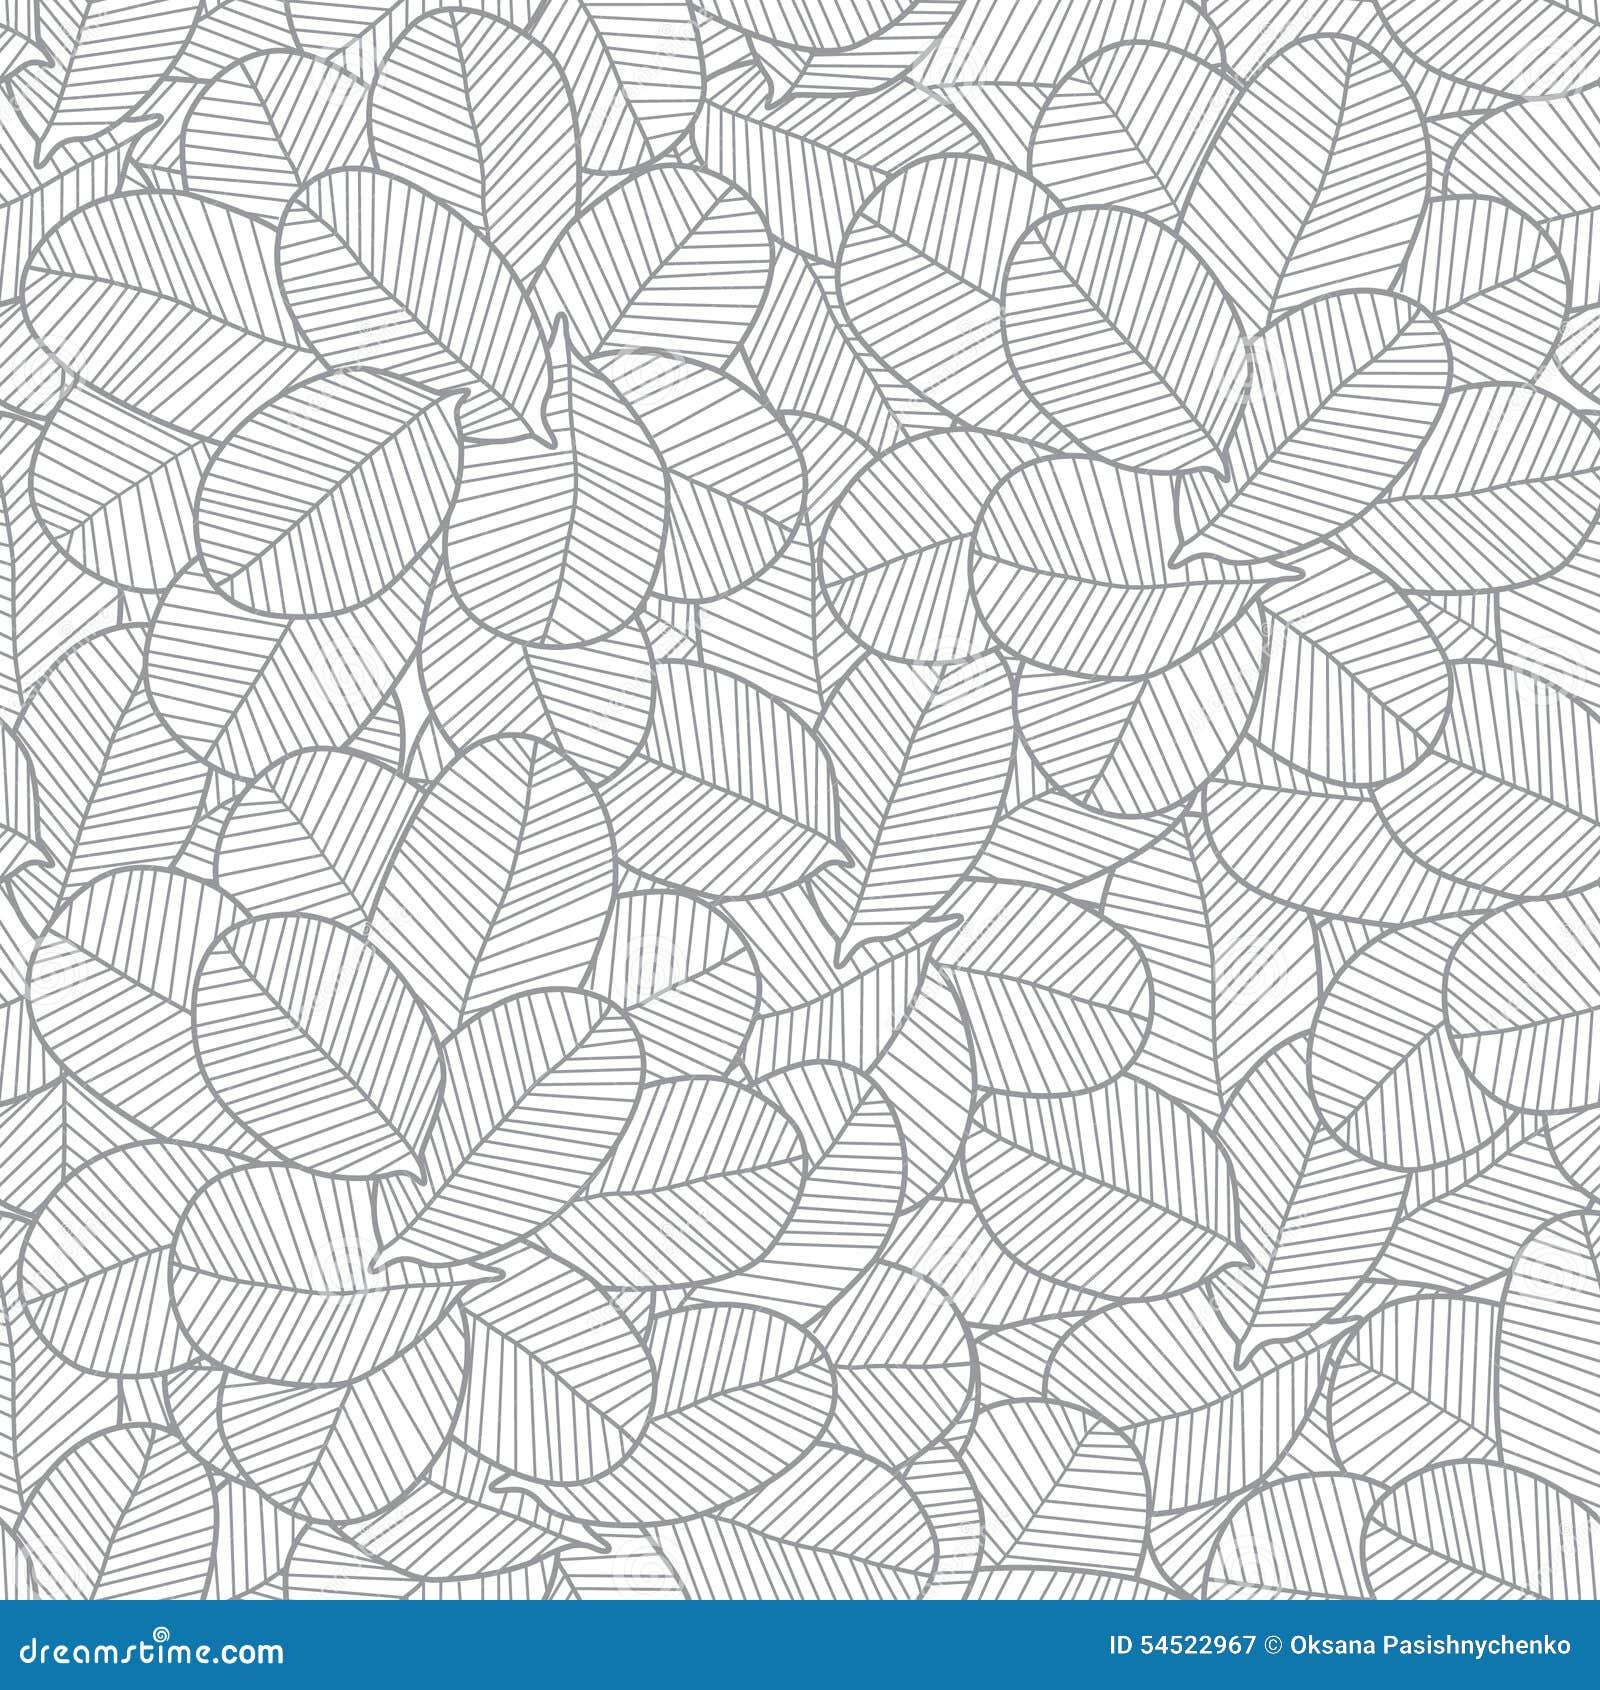 Line Art Web Design : Vector line art grey leaves texture seamless stock